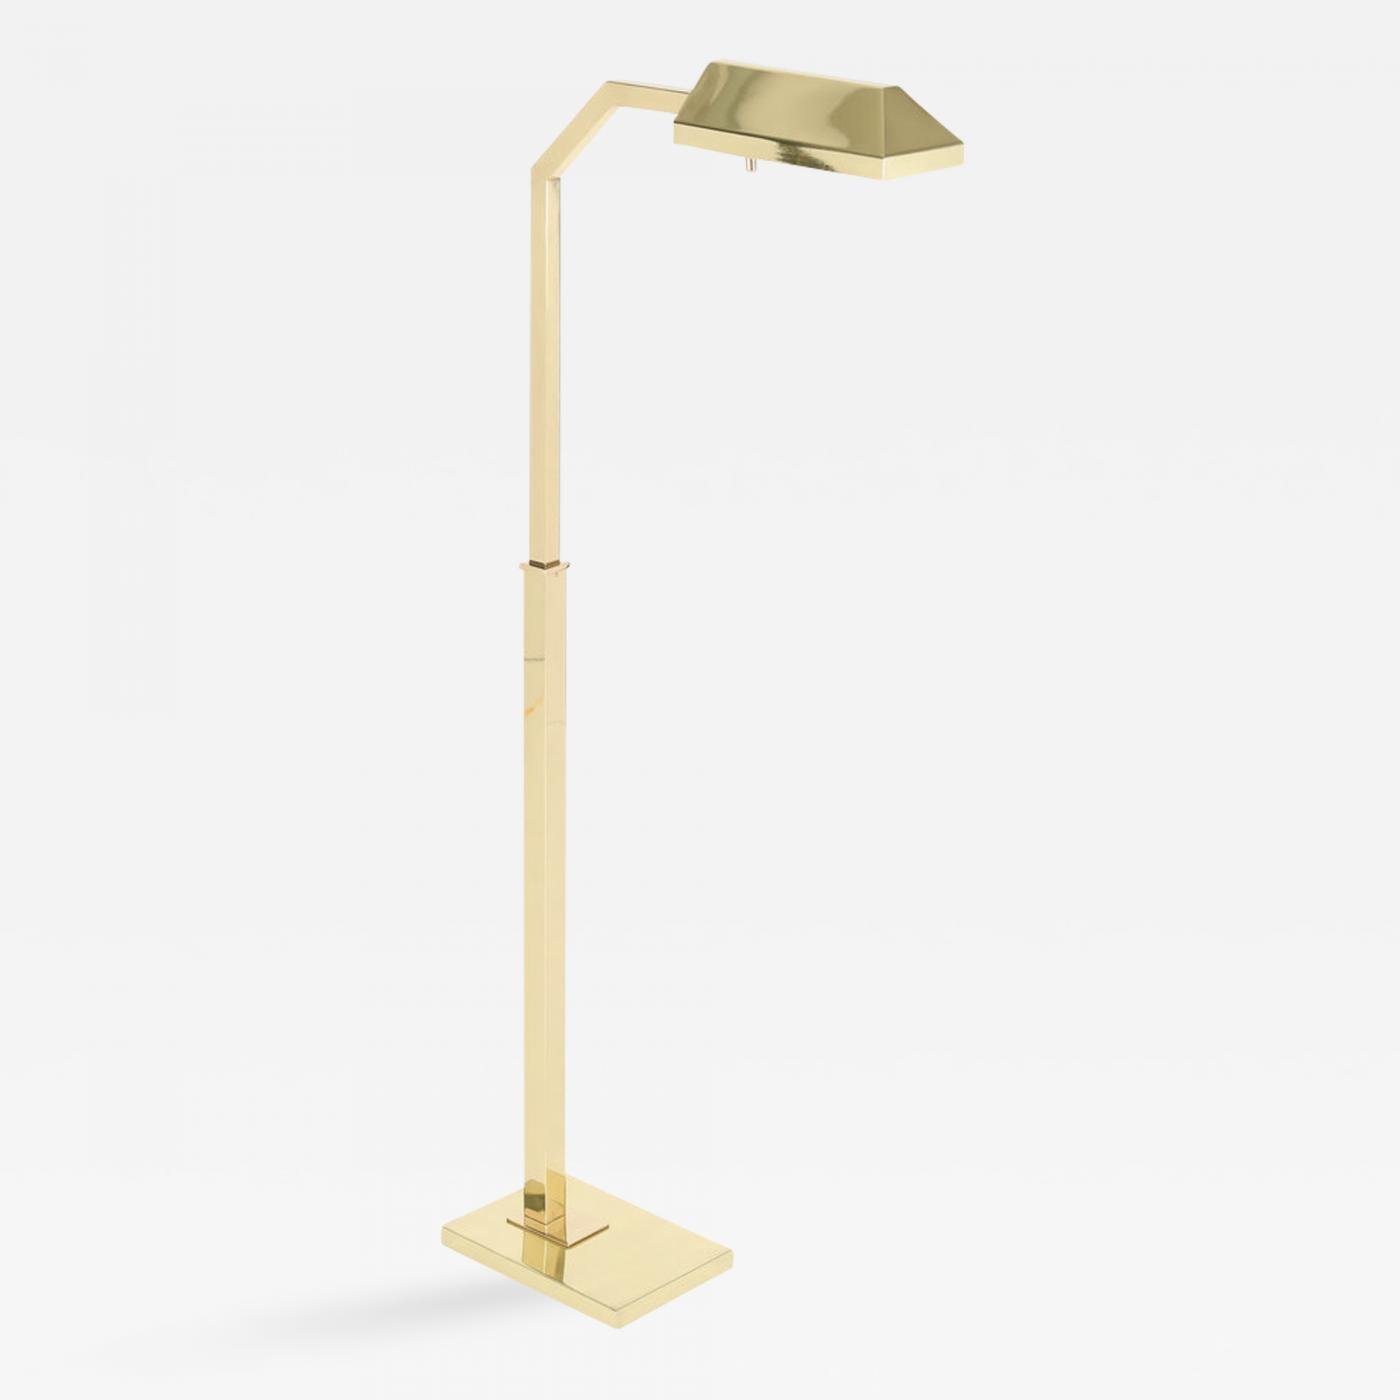 Chapman Mfg Co Quality Brass Floor Lamp By Chapman